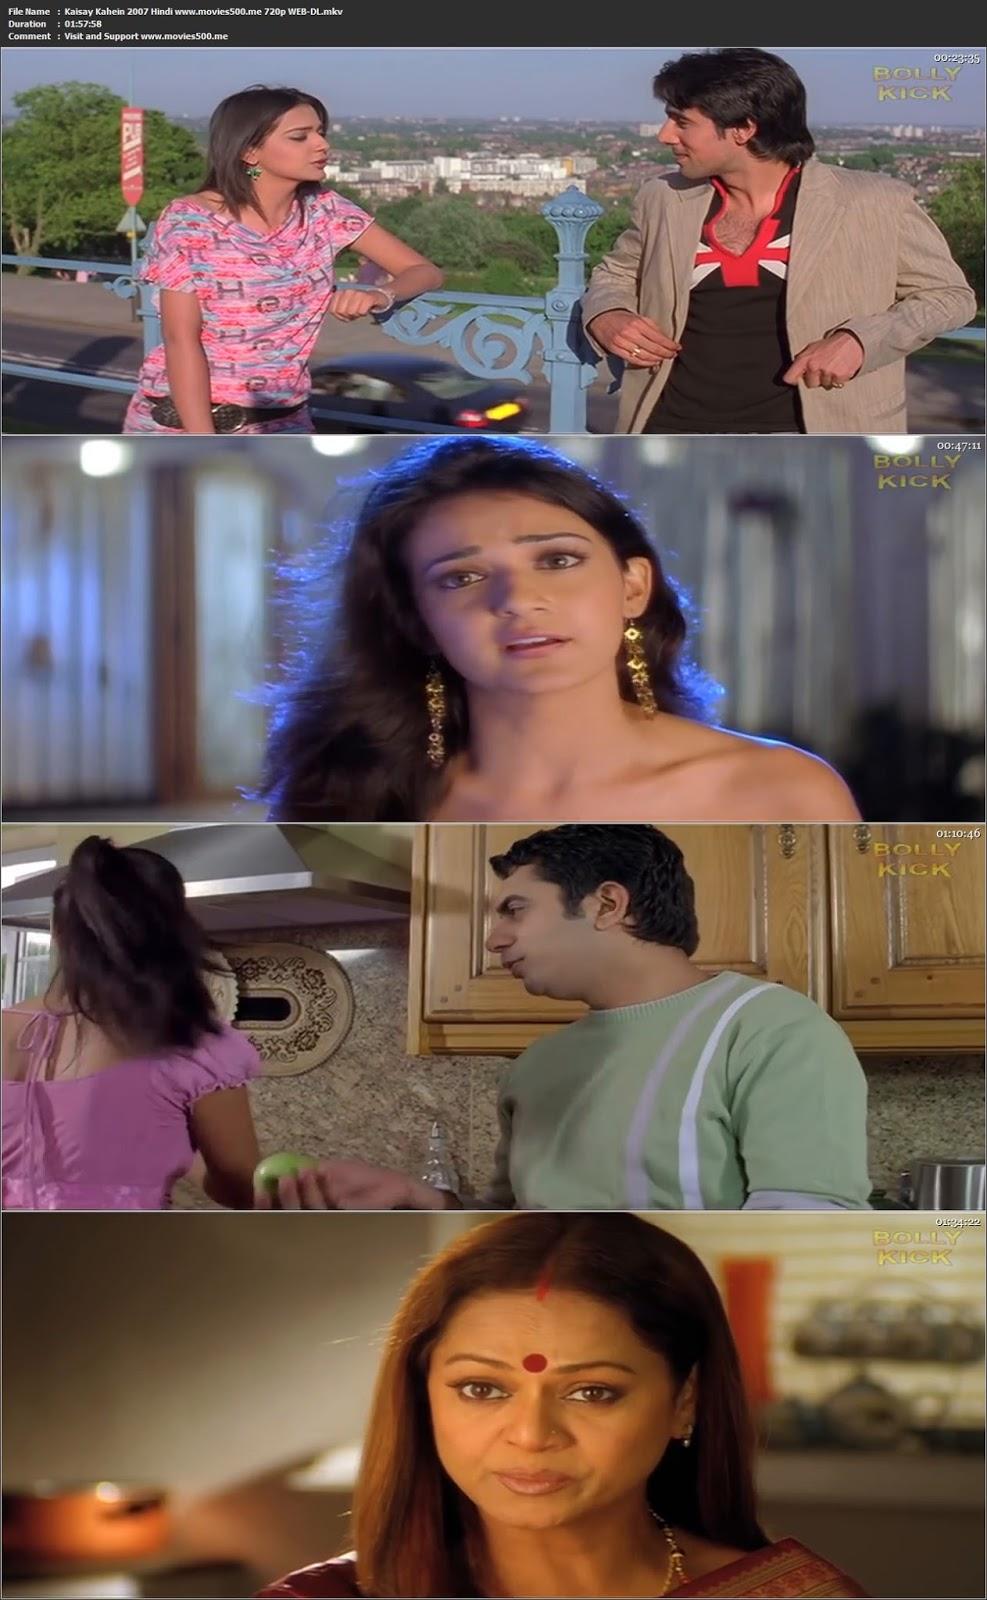 Kaisay Kahein 2007 Hindi Full Movie WEB DL 720p at softwaresonly.com